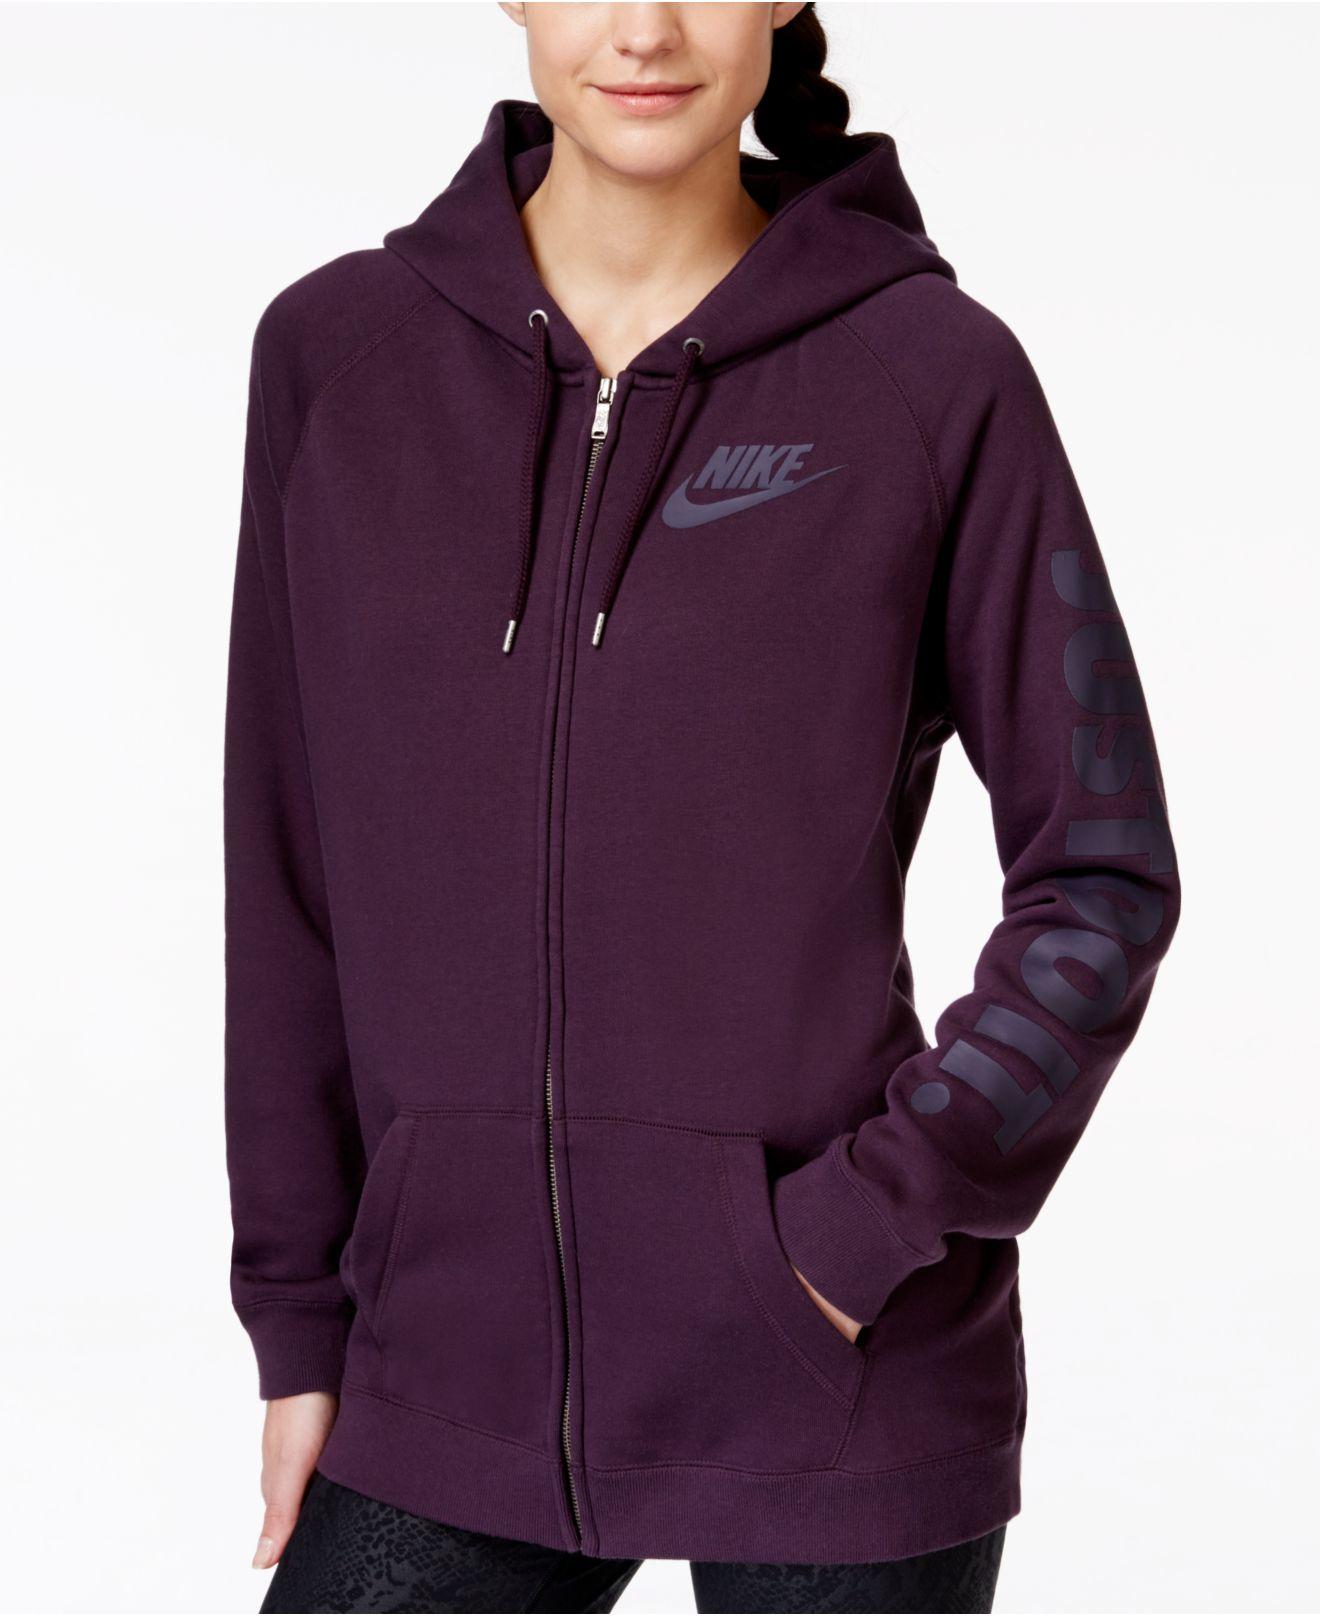 fa7d7369c395 Lyst - Nike Rally Zip-front Hoodie in Purple